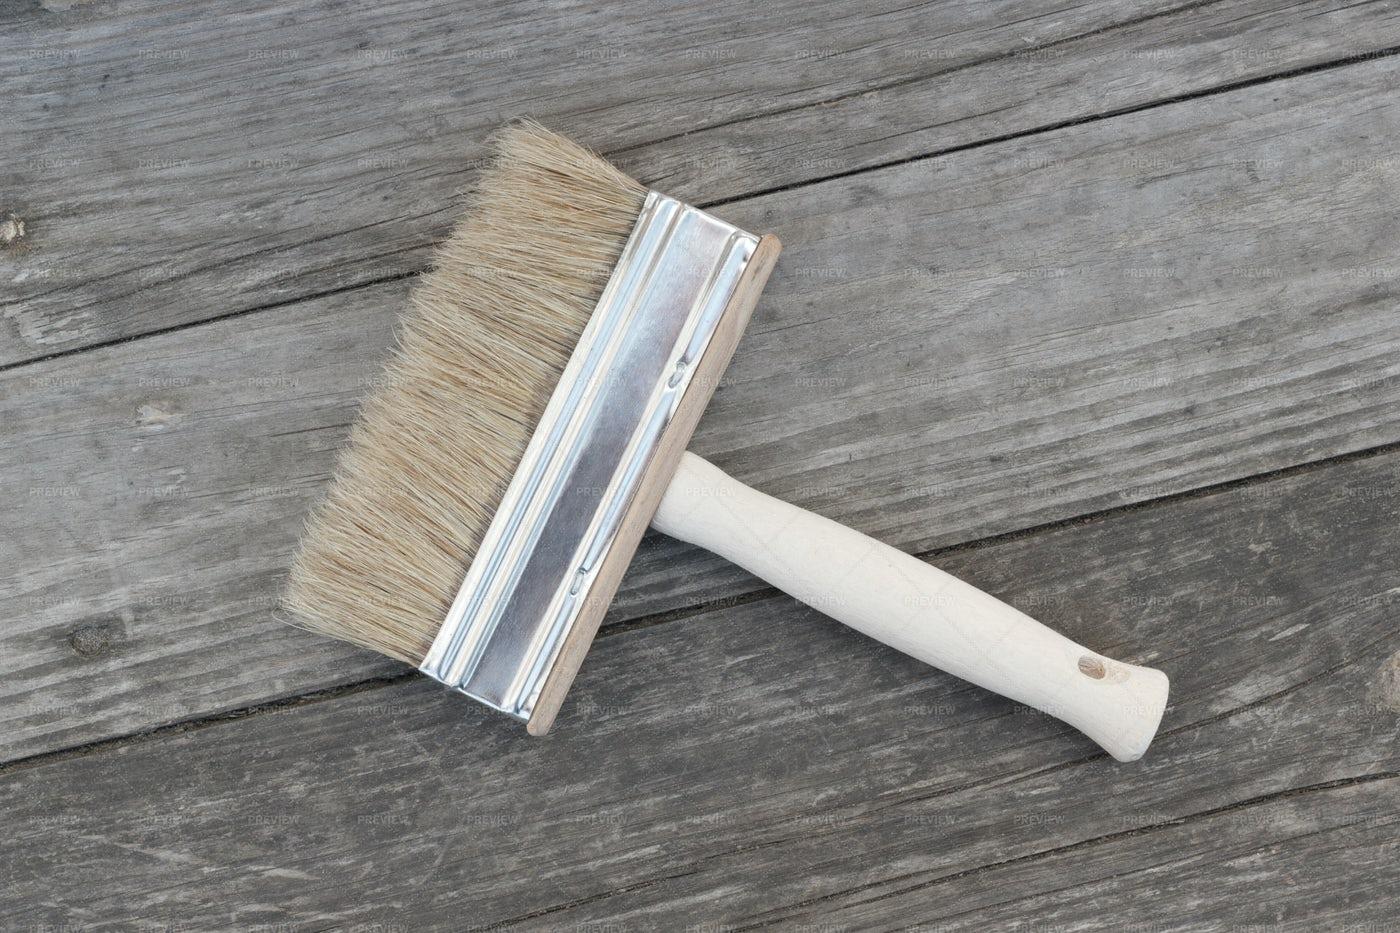 Brush On Wooden Background: Stock Photos